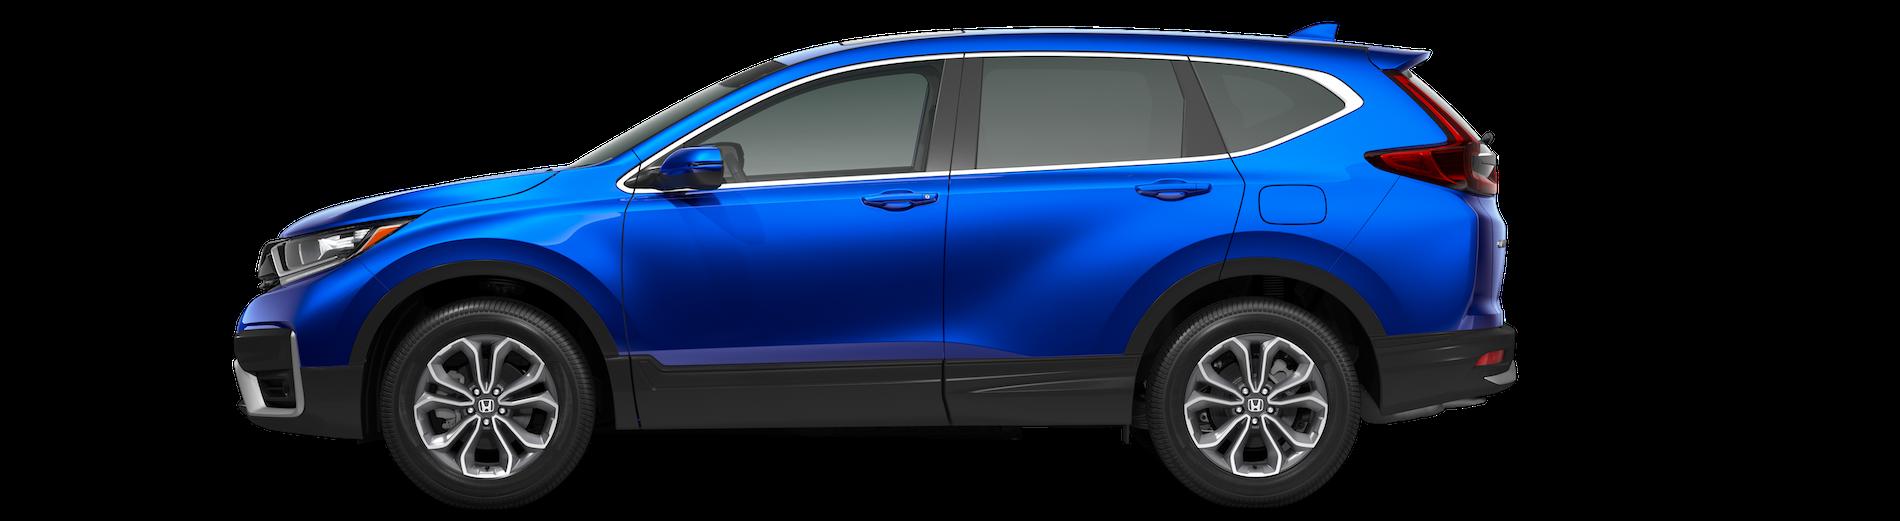 Honda CR-V Blue Side View